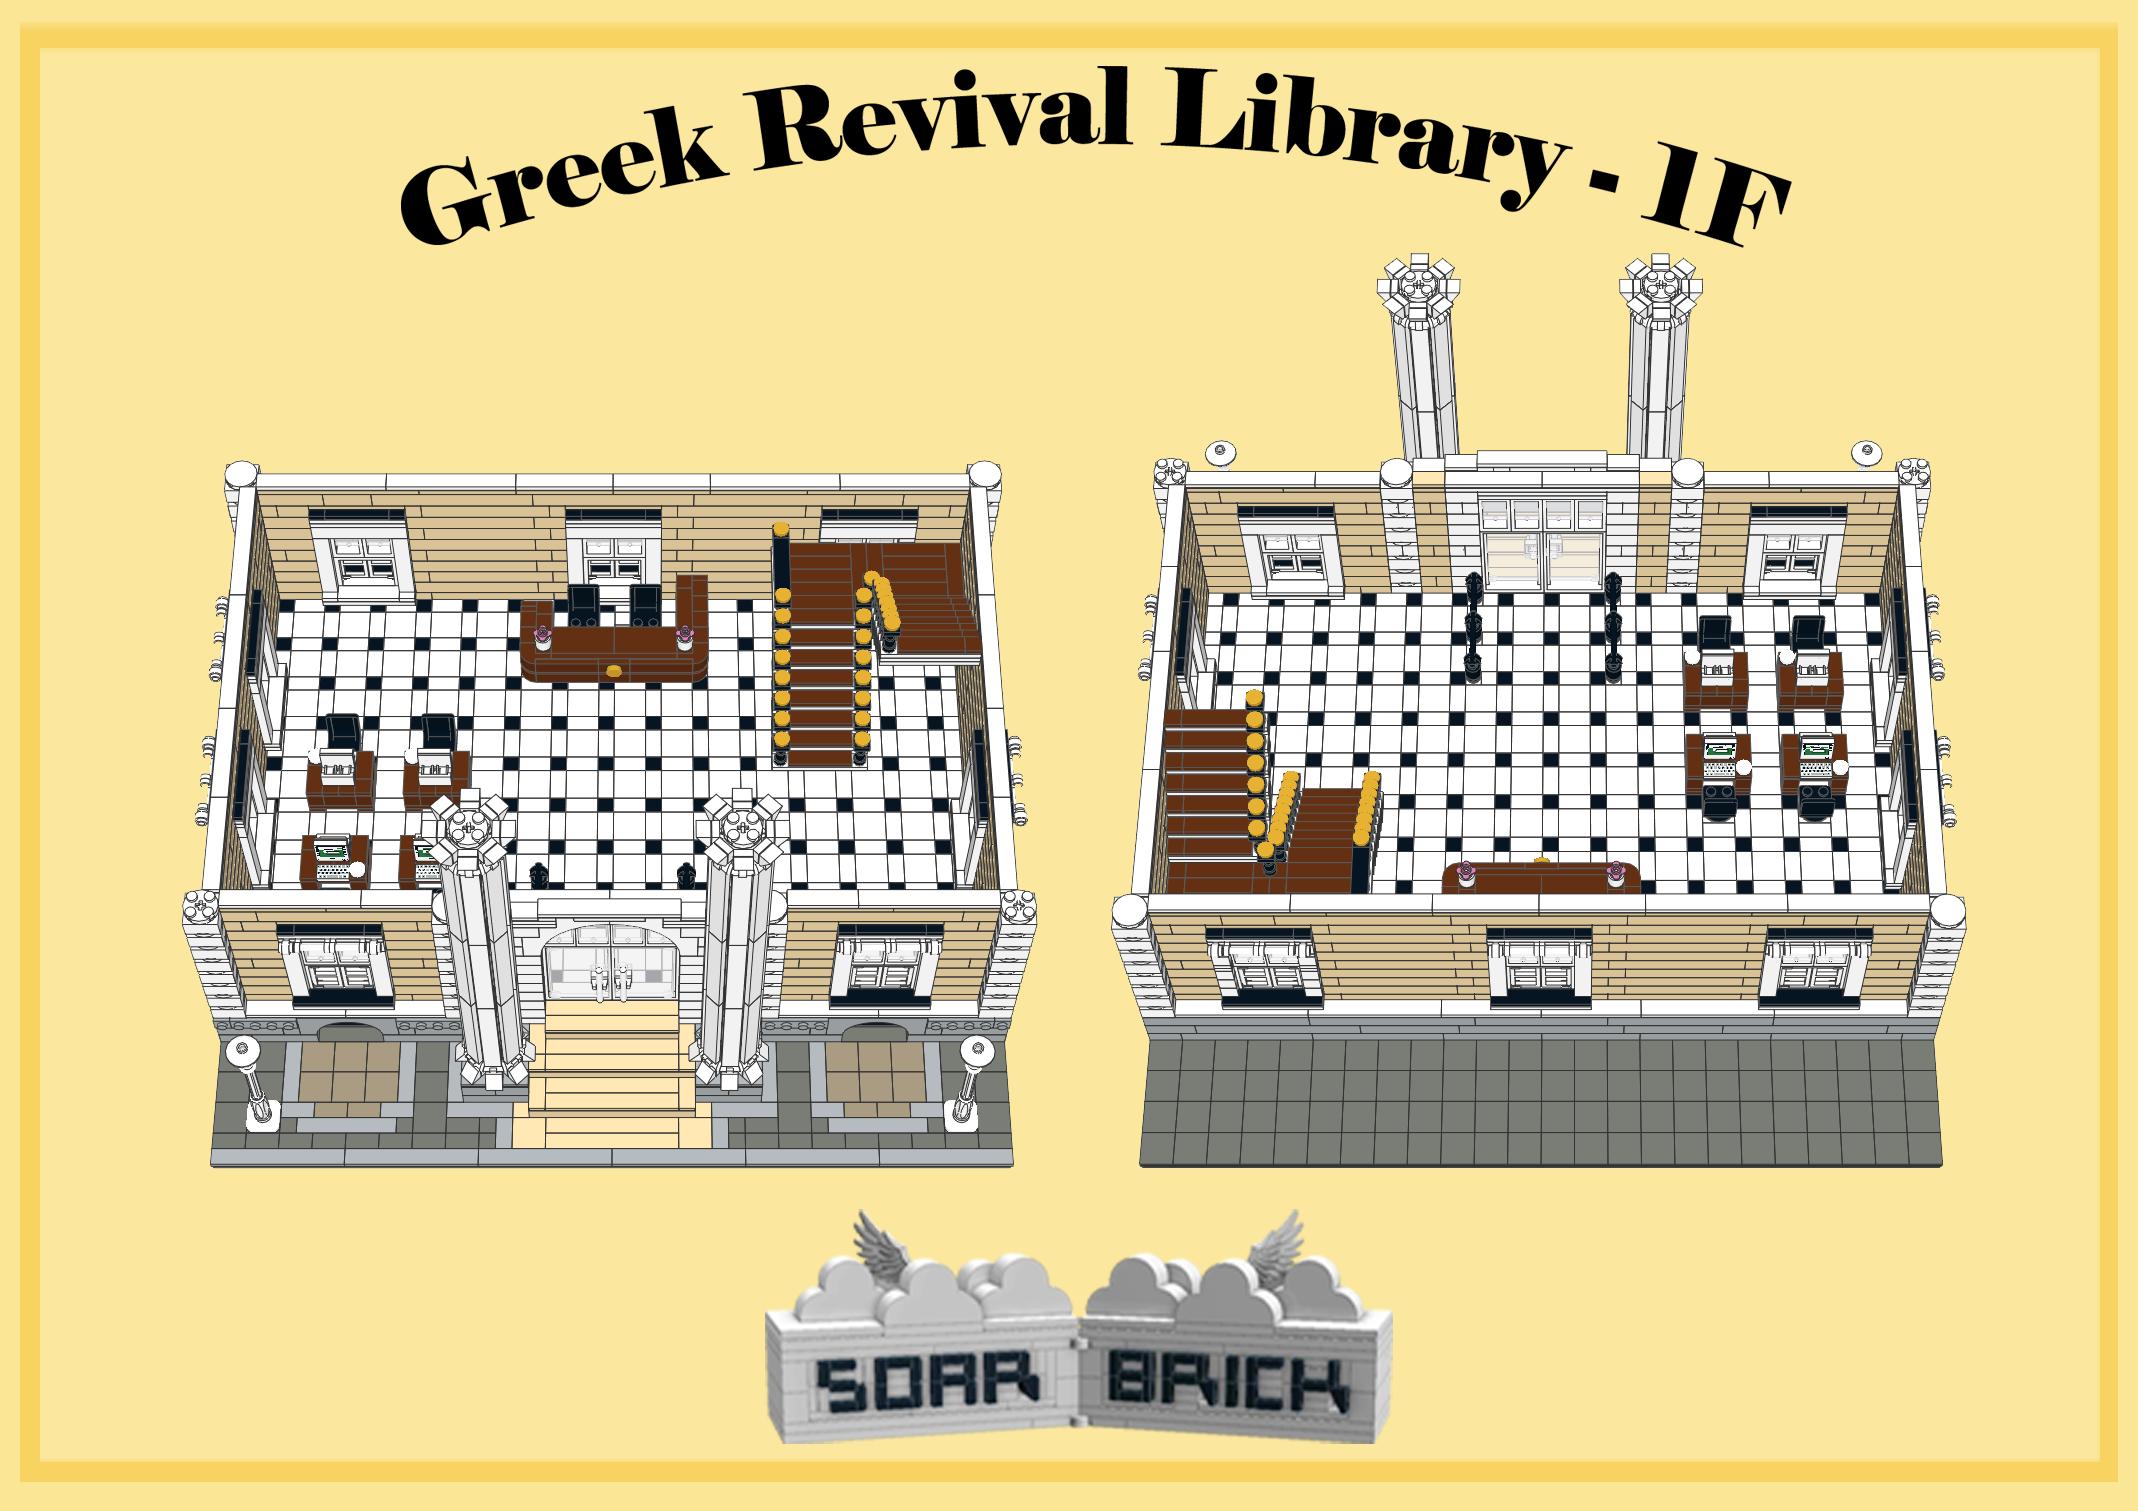 greek revival library bookshelves and enchantment tables Coffee Table Bookshelf